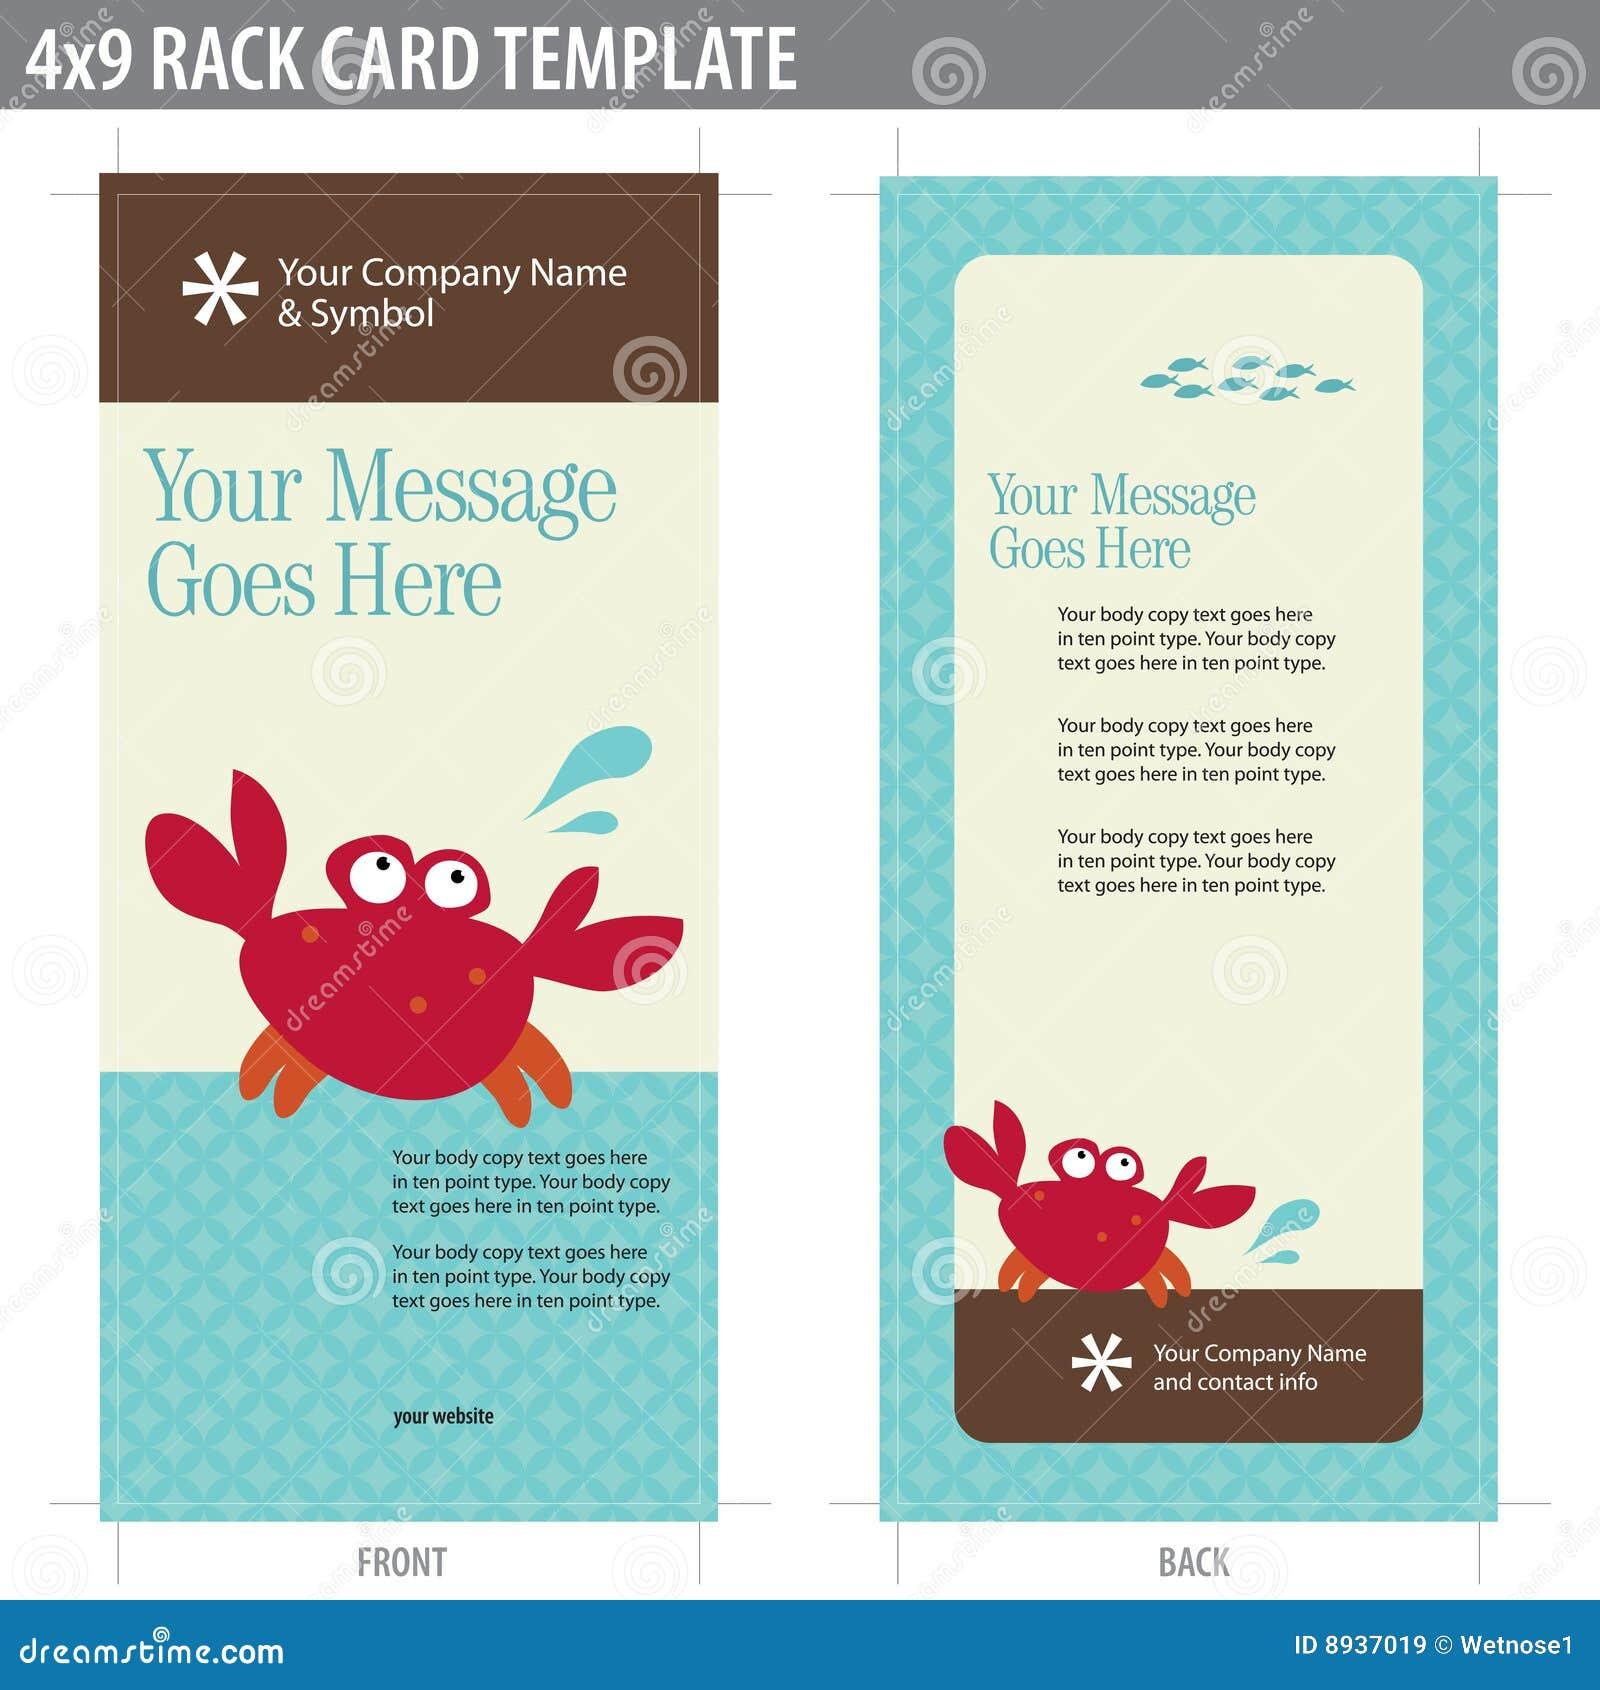 4x9 rack card broshure template royalty free stock images image 8937019. Black Bedroom Furniture Sets. Home Design Ideas